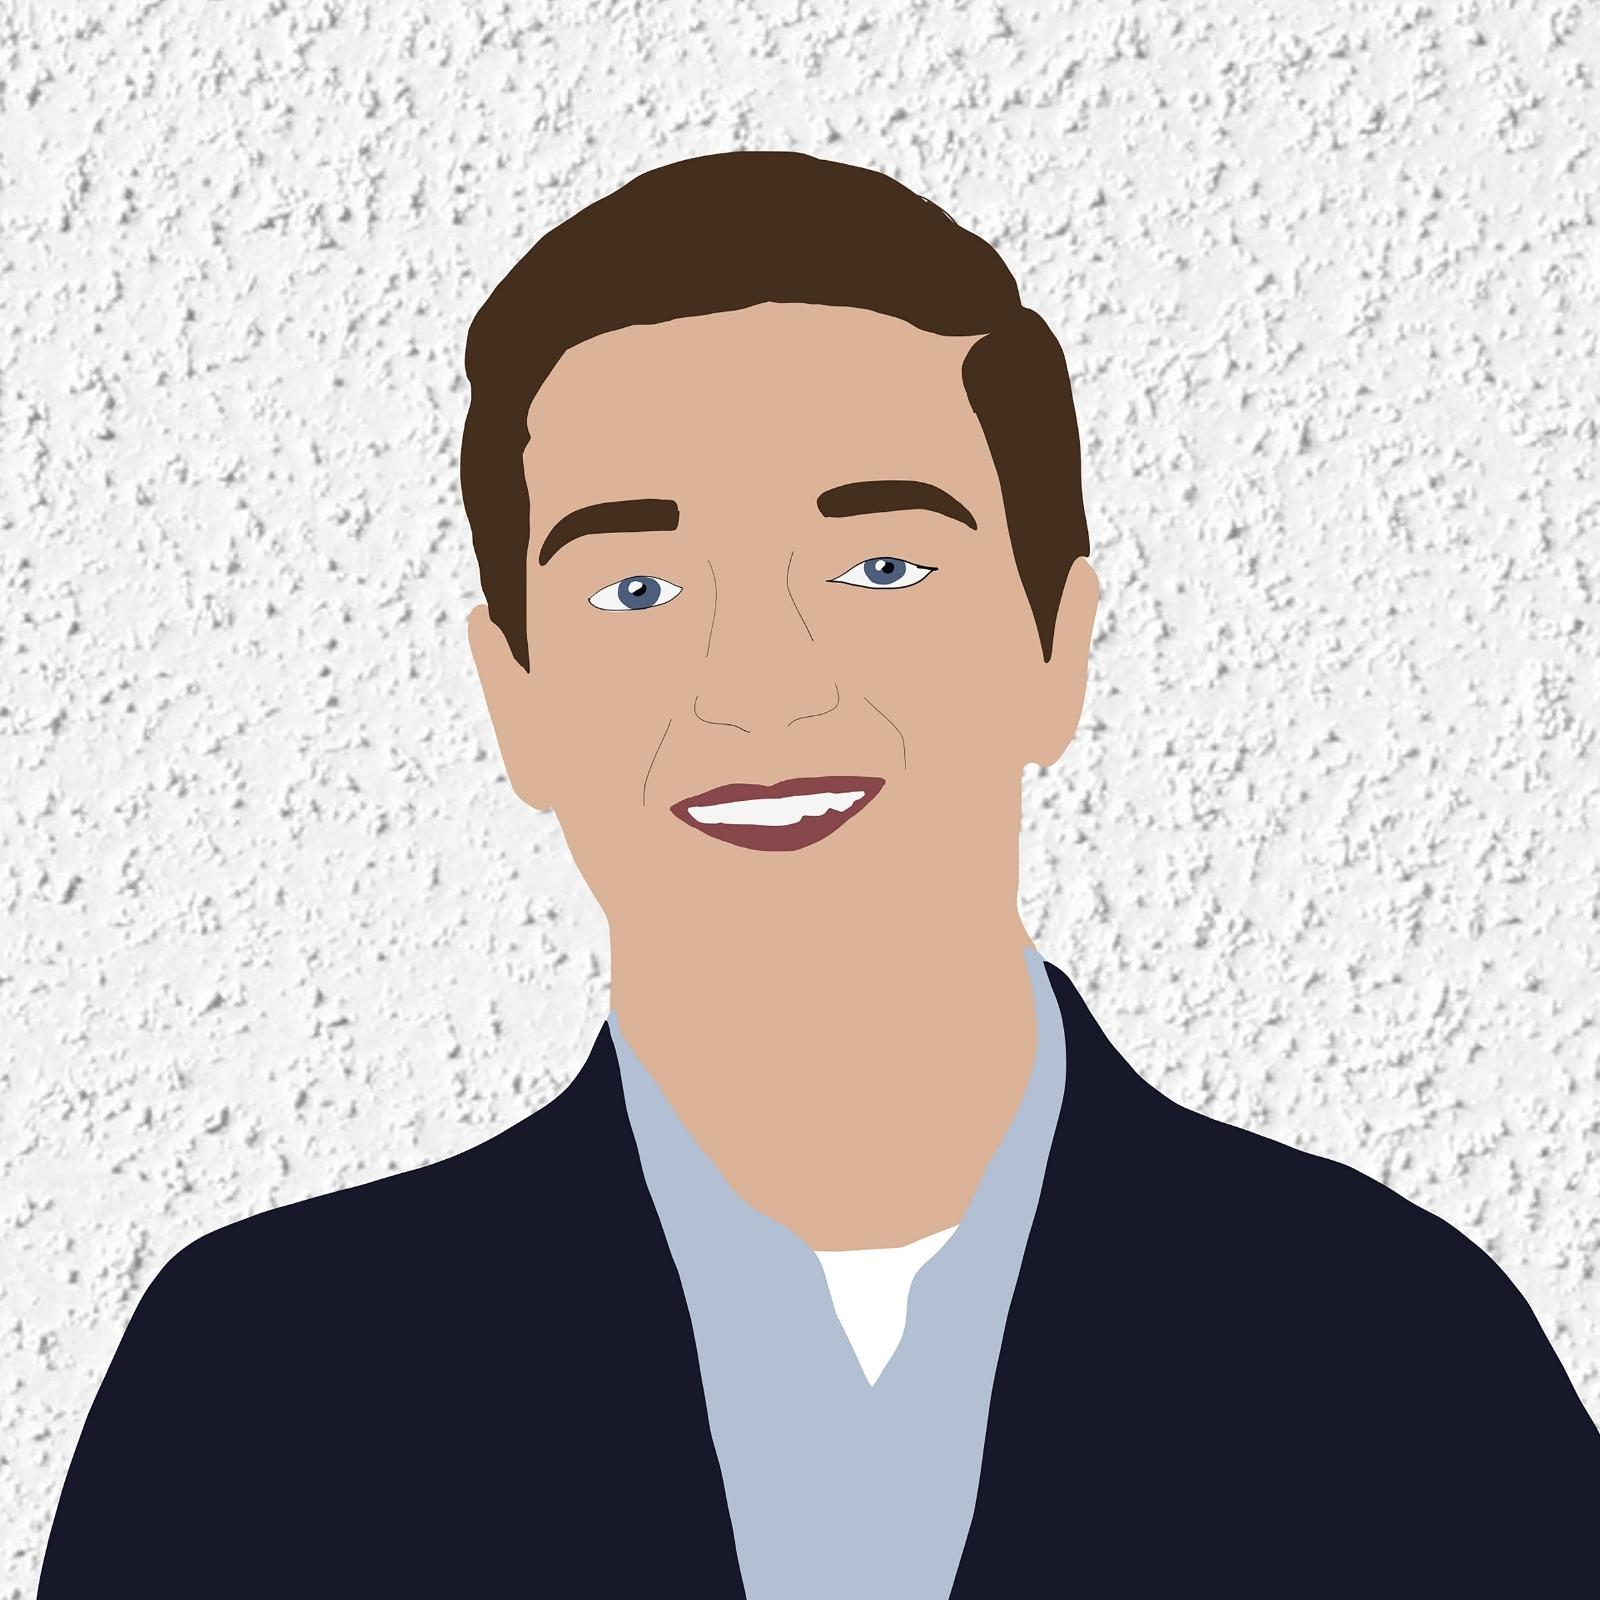 Digital illustration of Kyle smiling against a white stucco background.